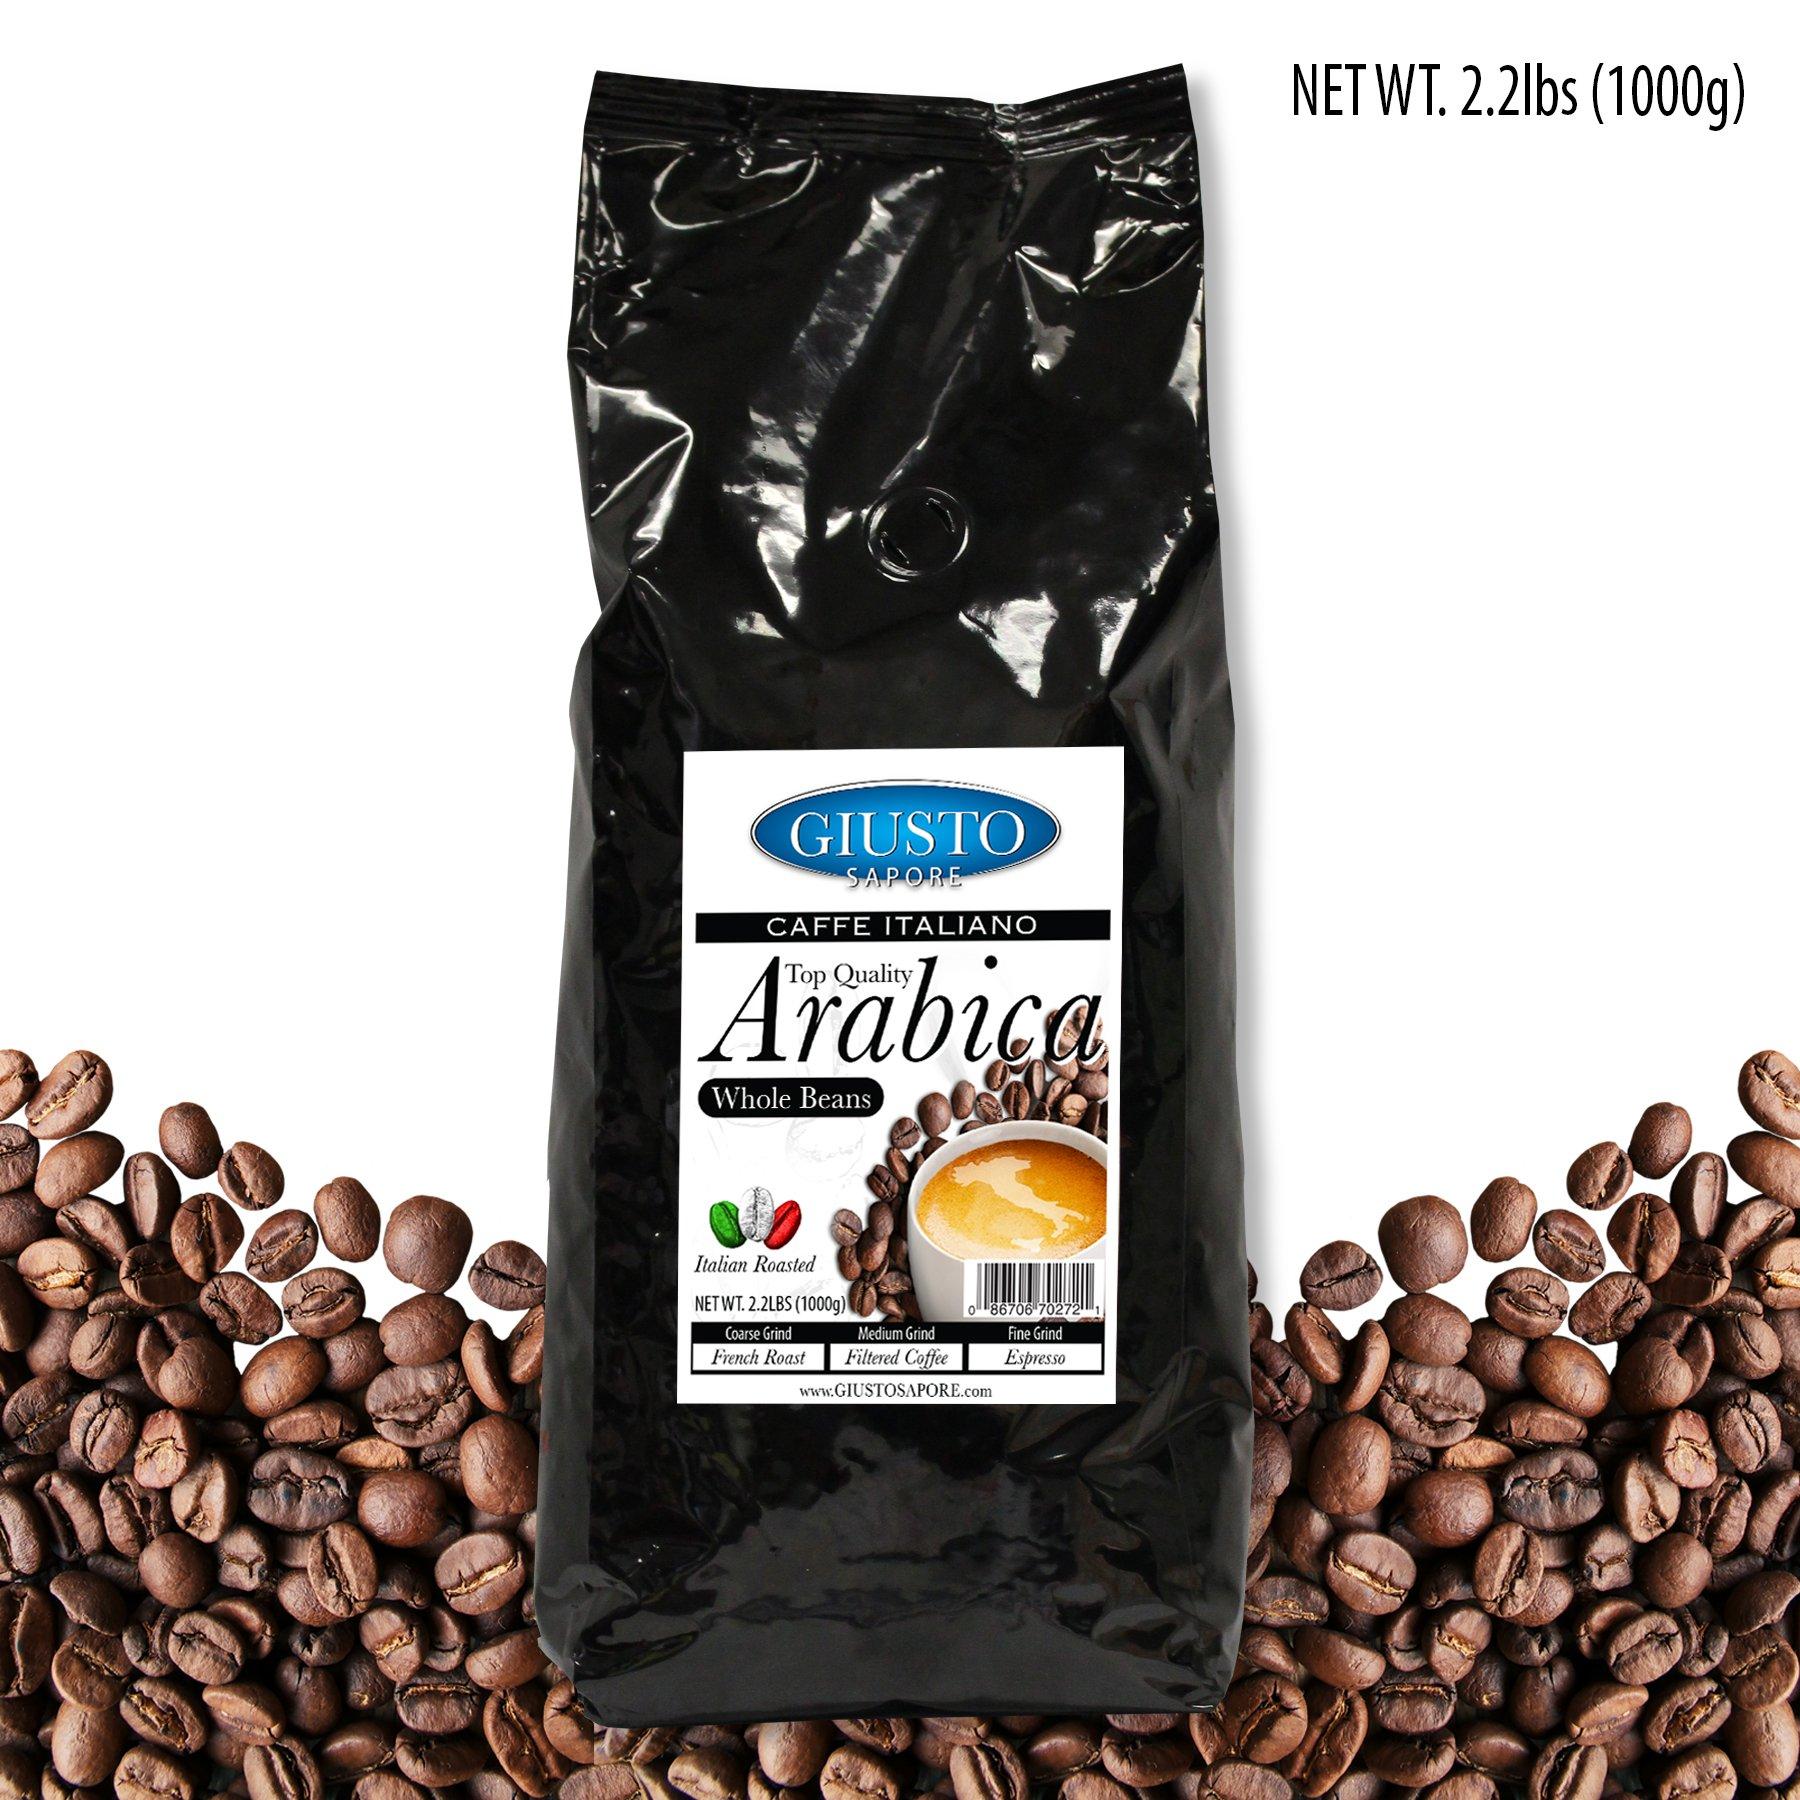 Giusto Sapore Caffe Italiano Italian Roasted Top Quality Arabica Whole Coffee Beans - Premium Superior Quality Gourmet Brand - Family Owned